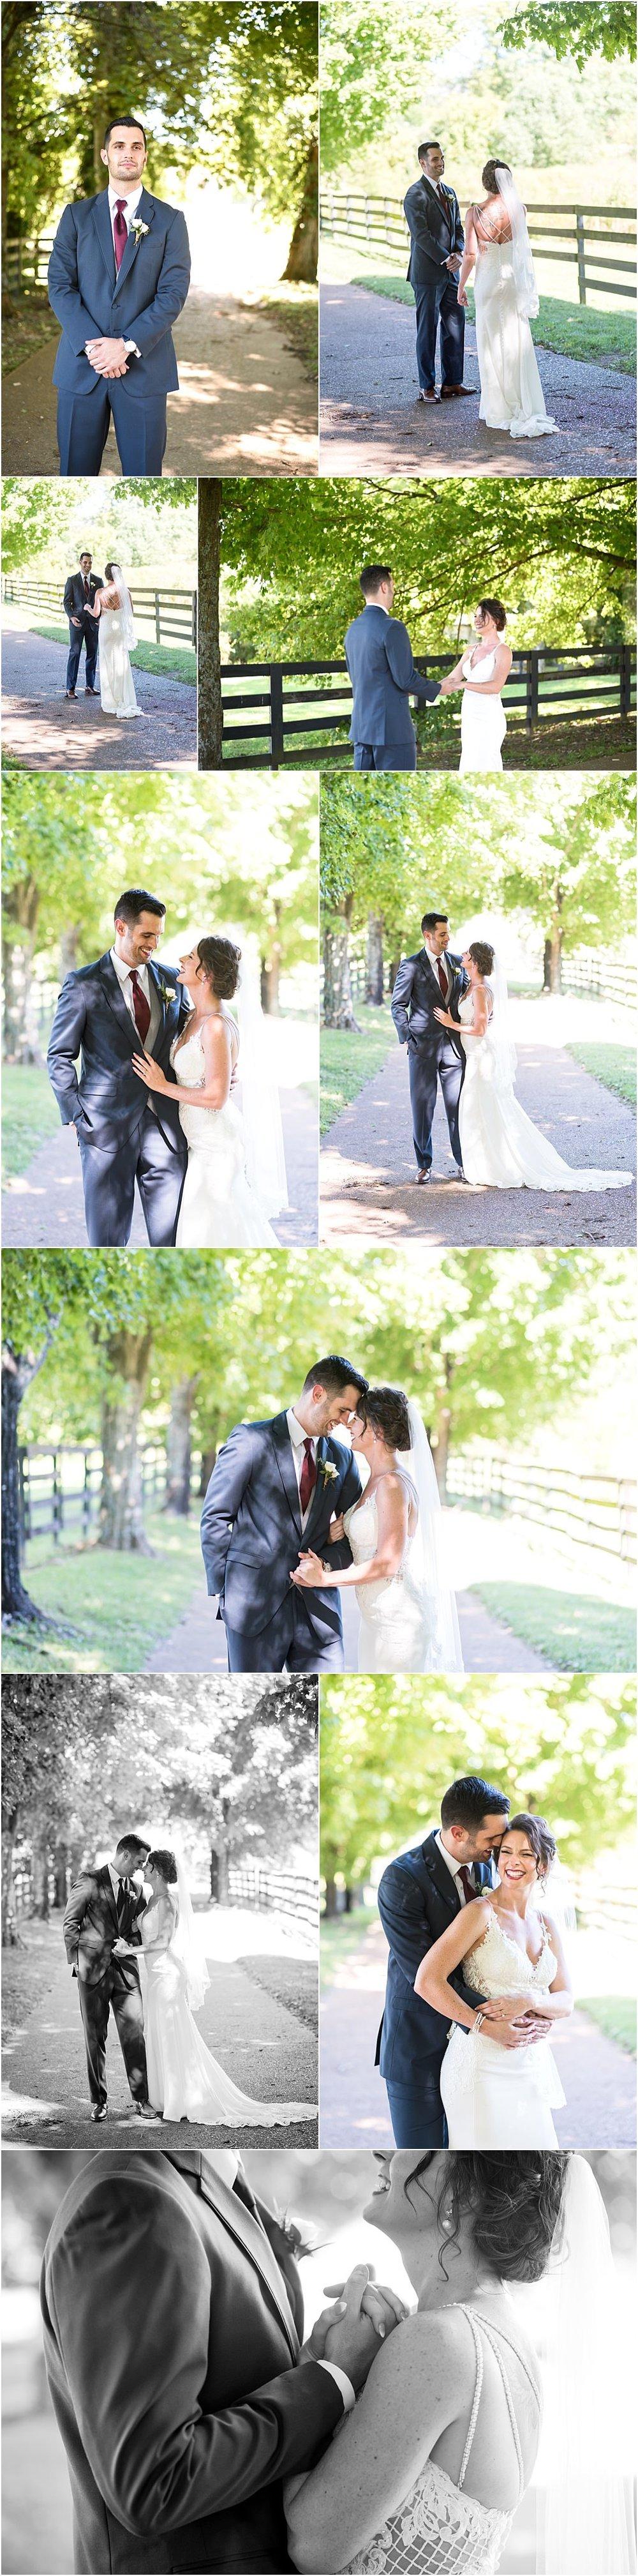 Jordan-and-Anna-Ravenswood-Mansion-Wedding-in-Brentwood-TN-Nashville-Wedding-Photographers+3